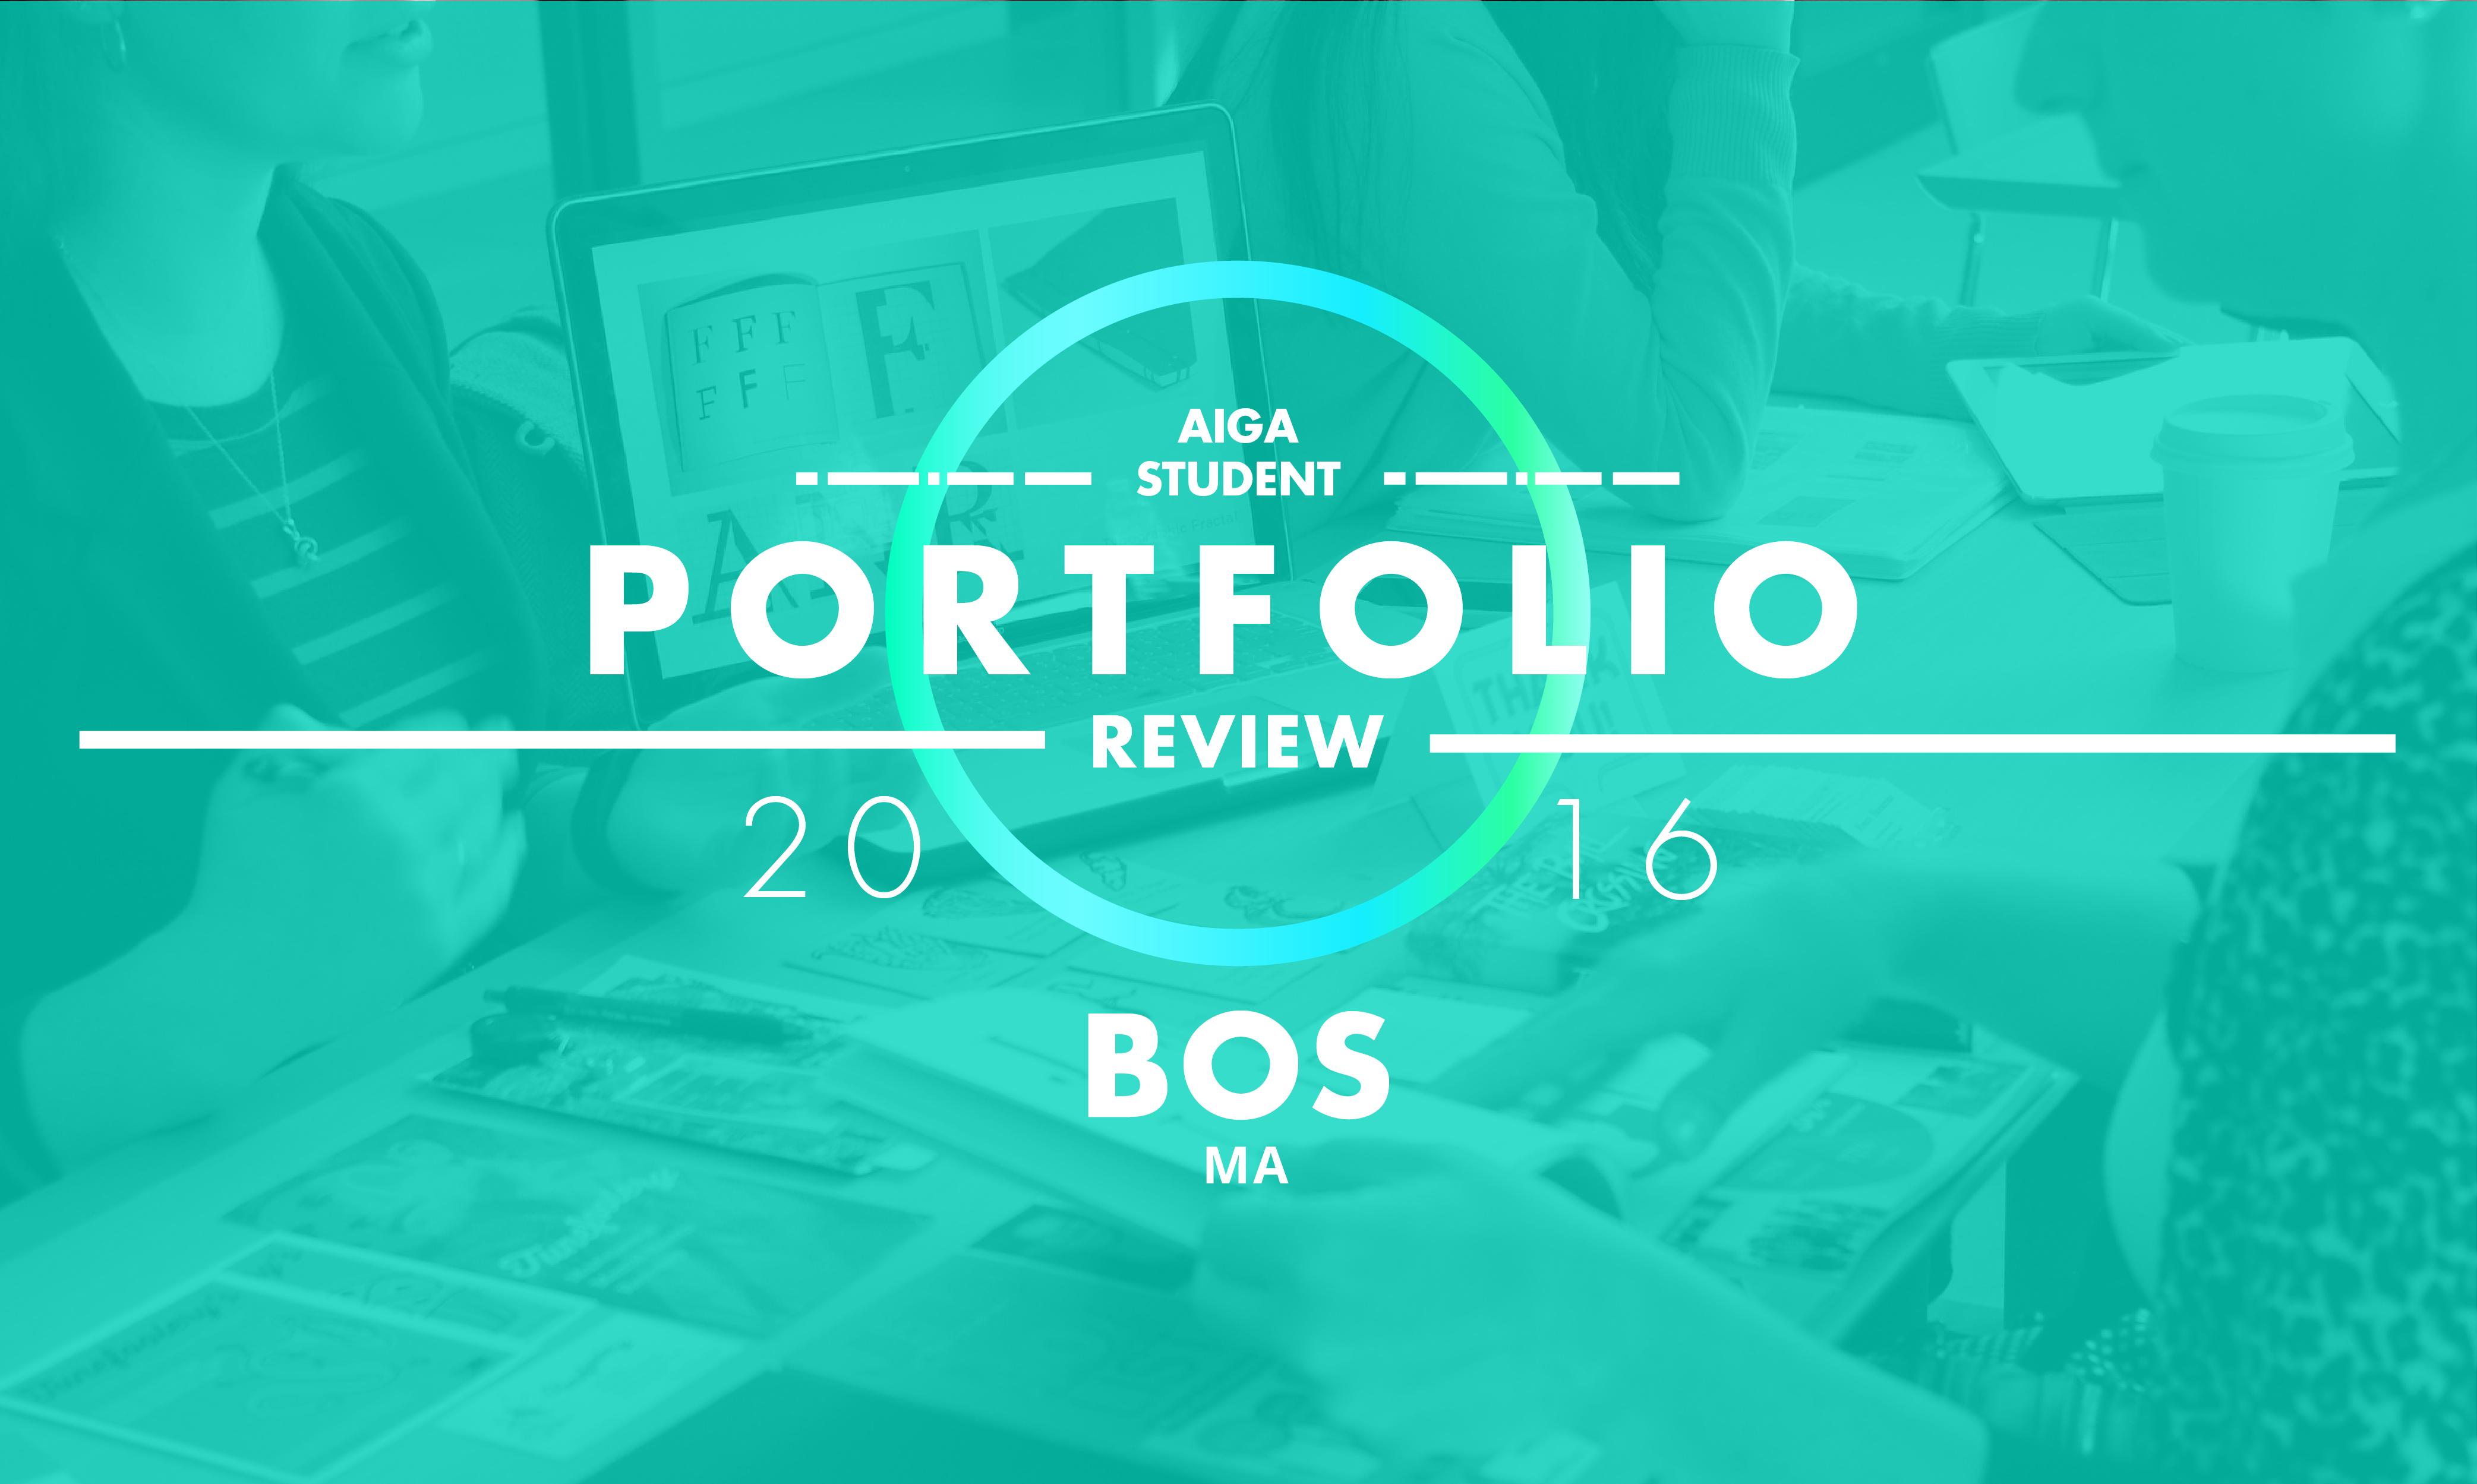 2016 student portfolio review